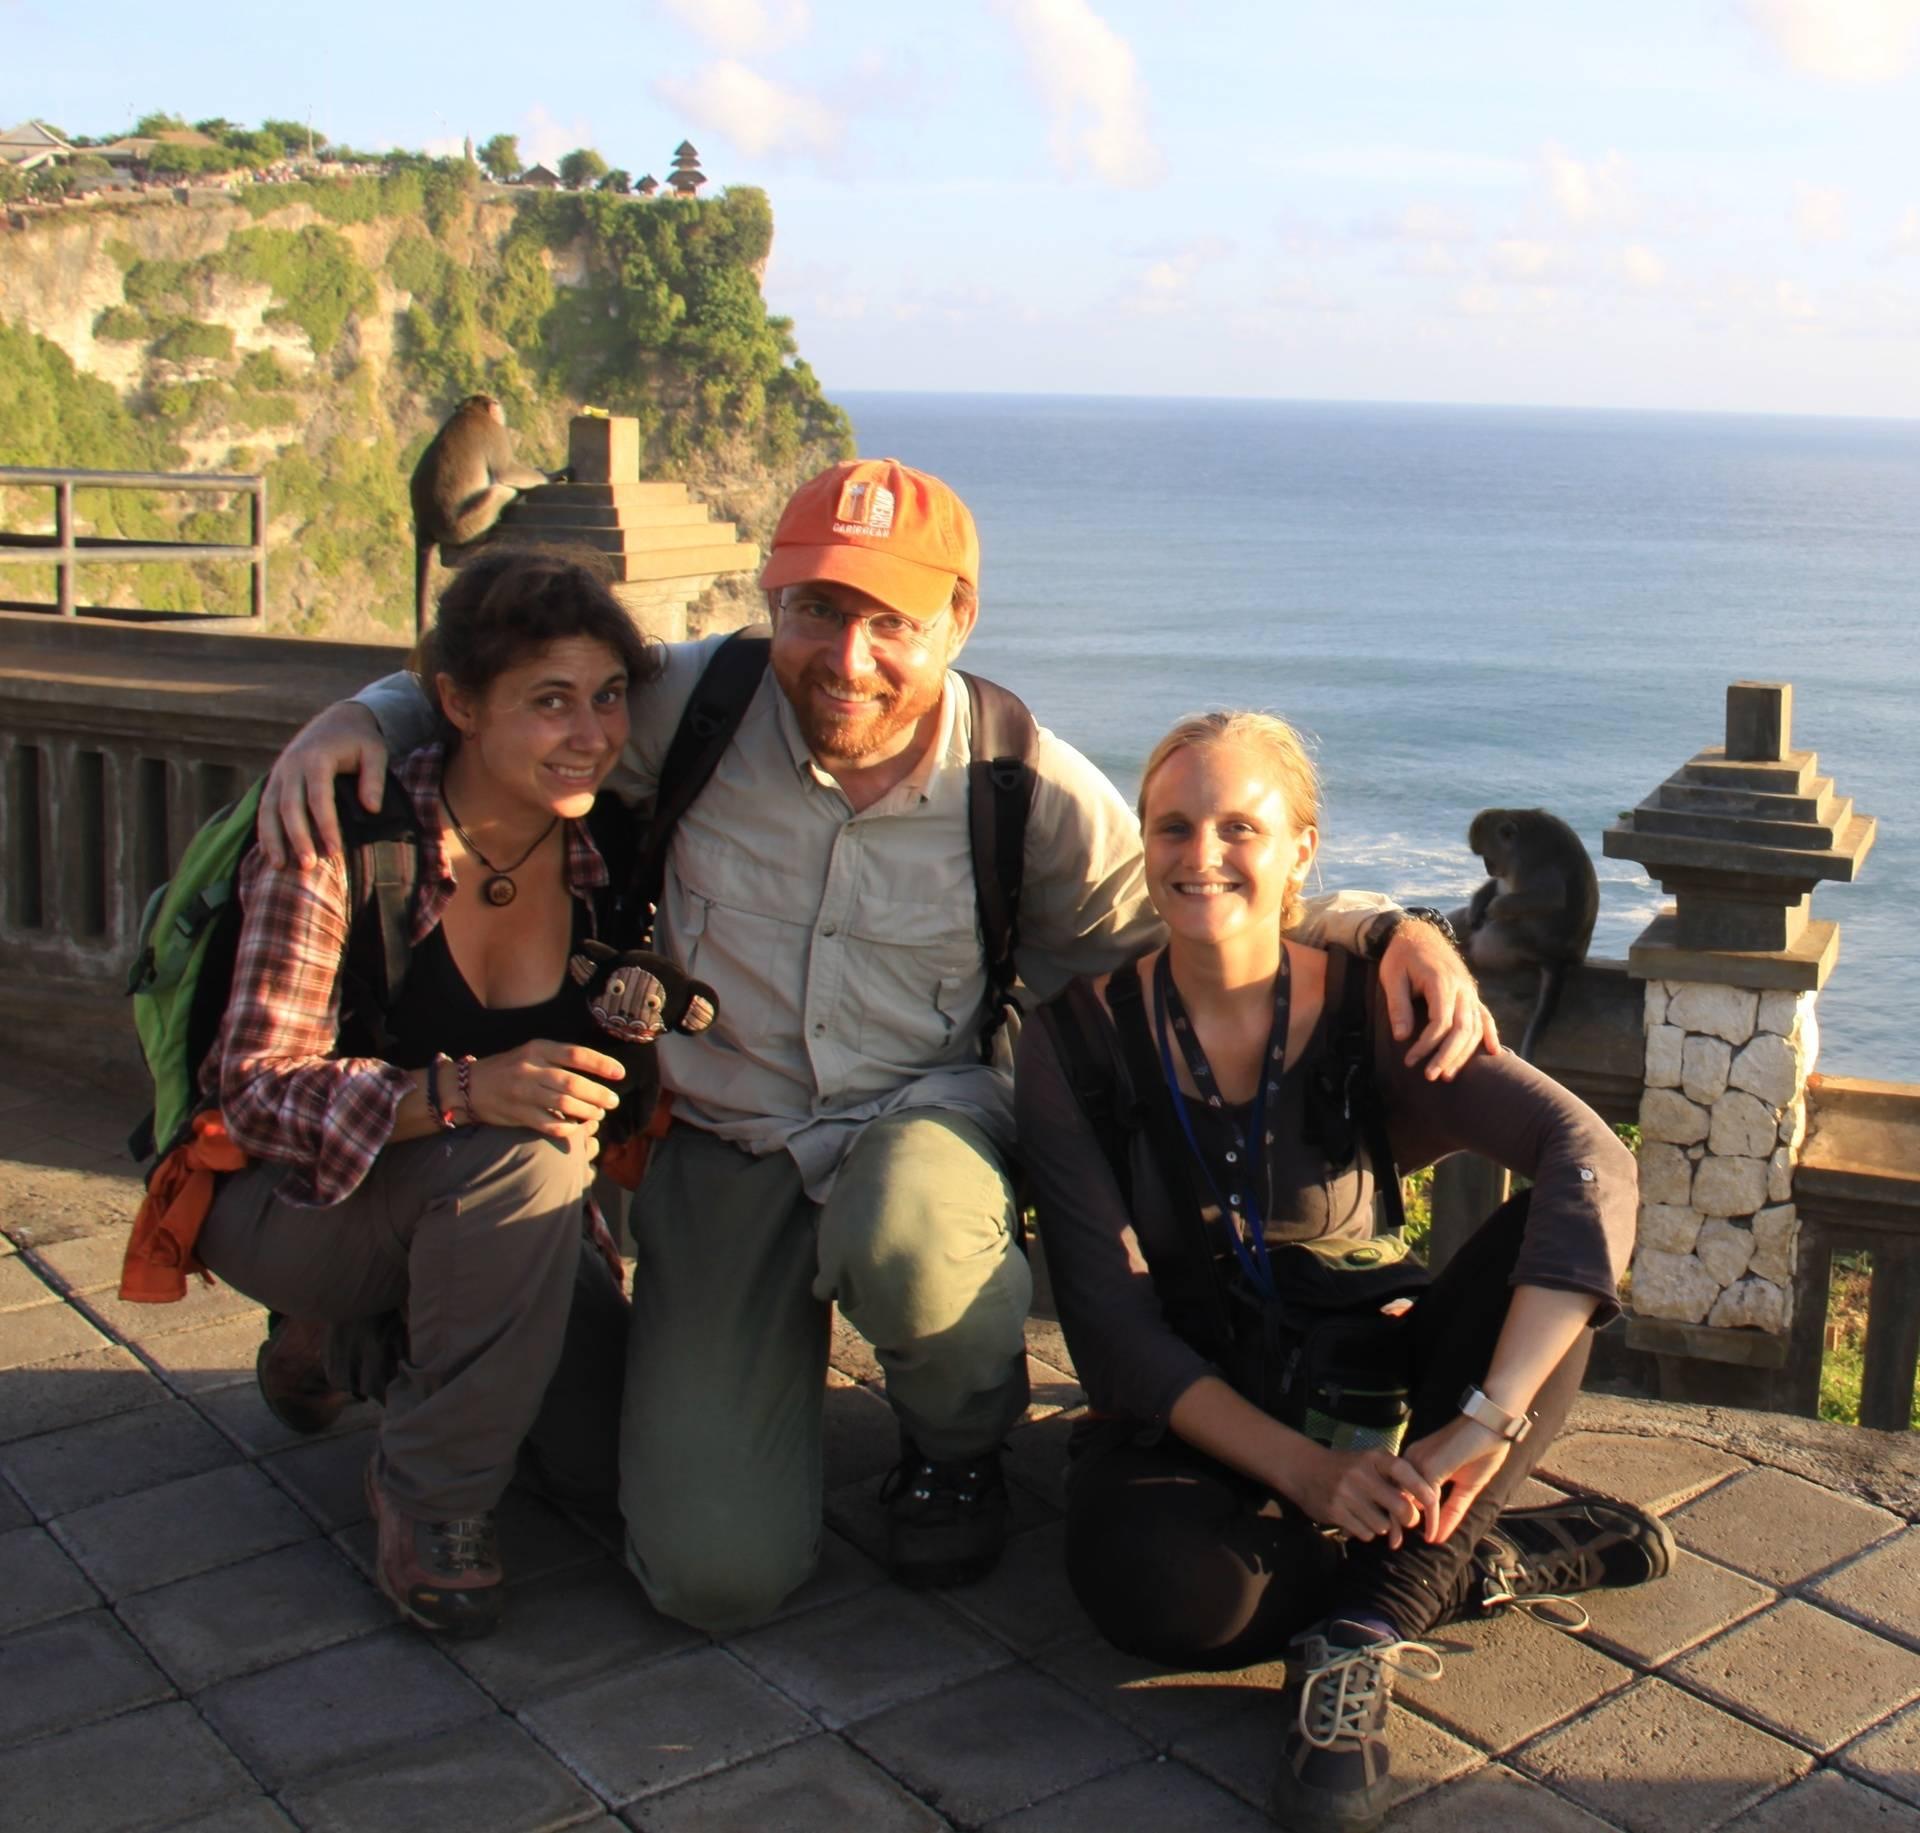 Lucía Jorge Sales (holding Panamá!), JB Leca, and Fany Brotcorne (Uluwatu, Bali, May 2016)